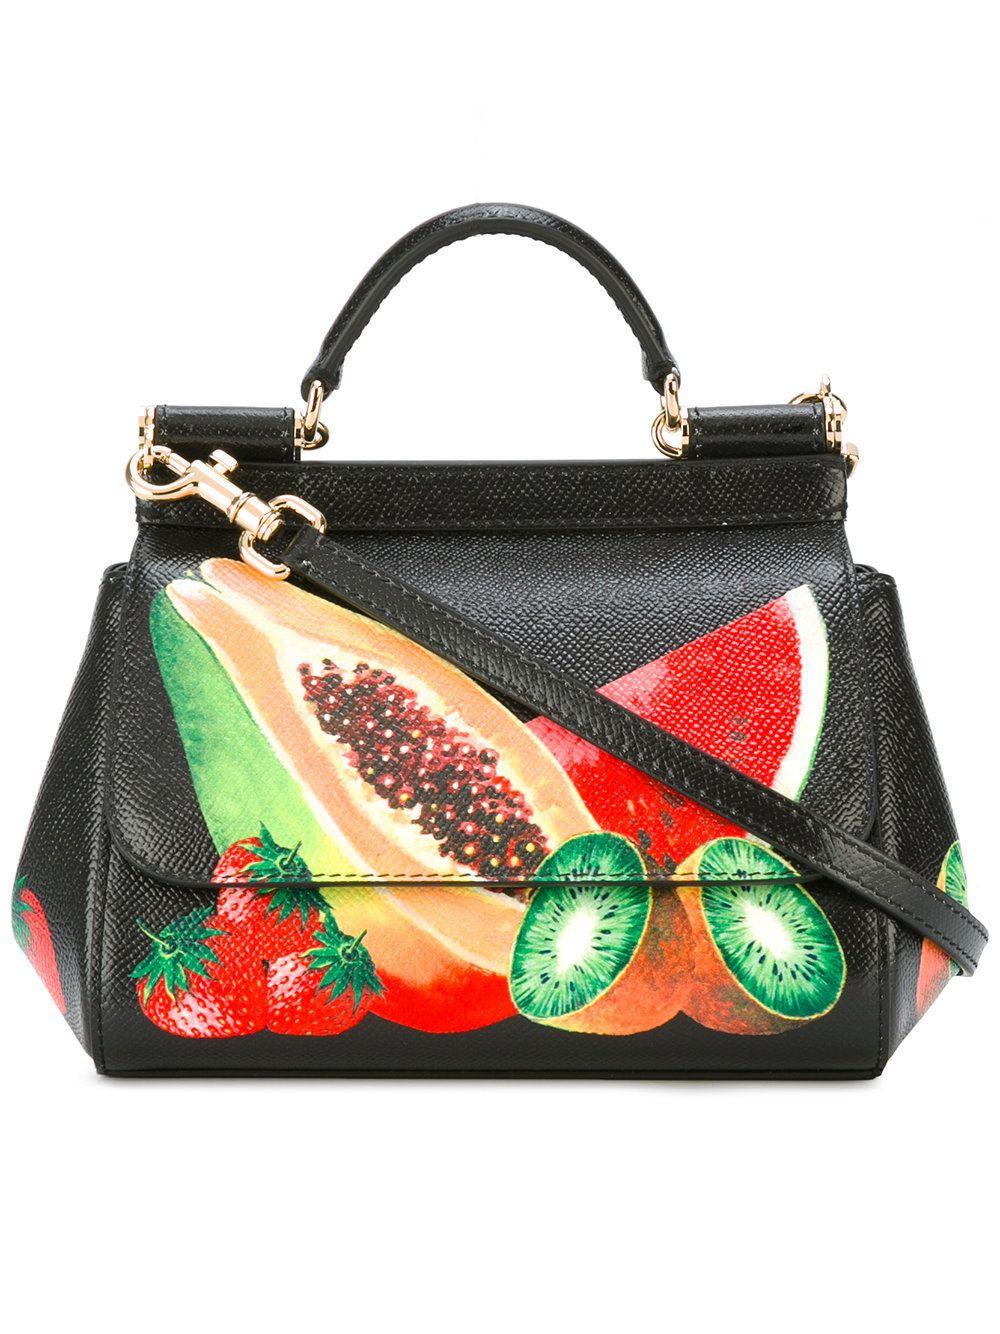 6d87bc1827 Dolce   Gabbana fruit print bag  998